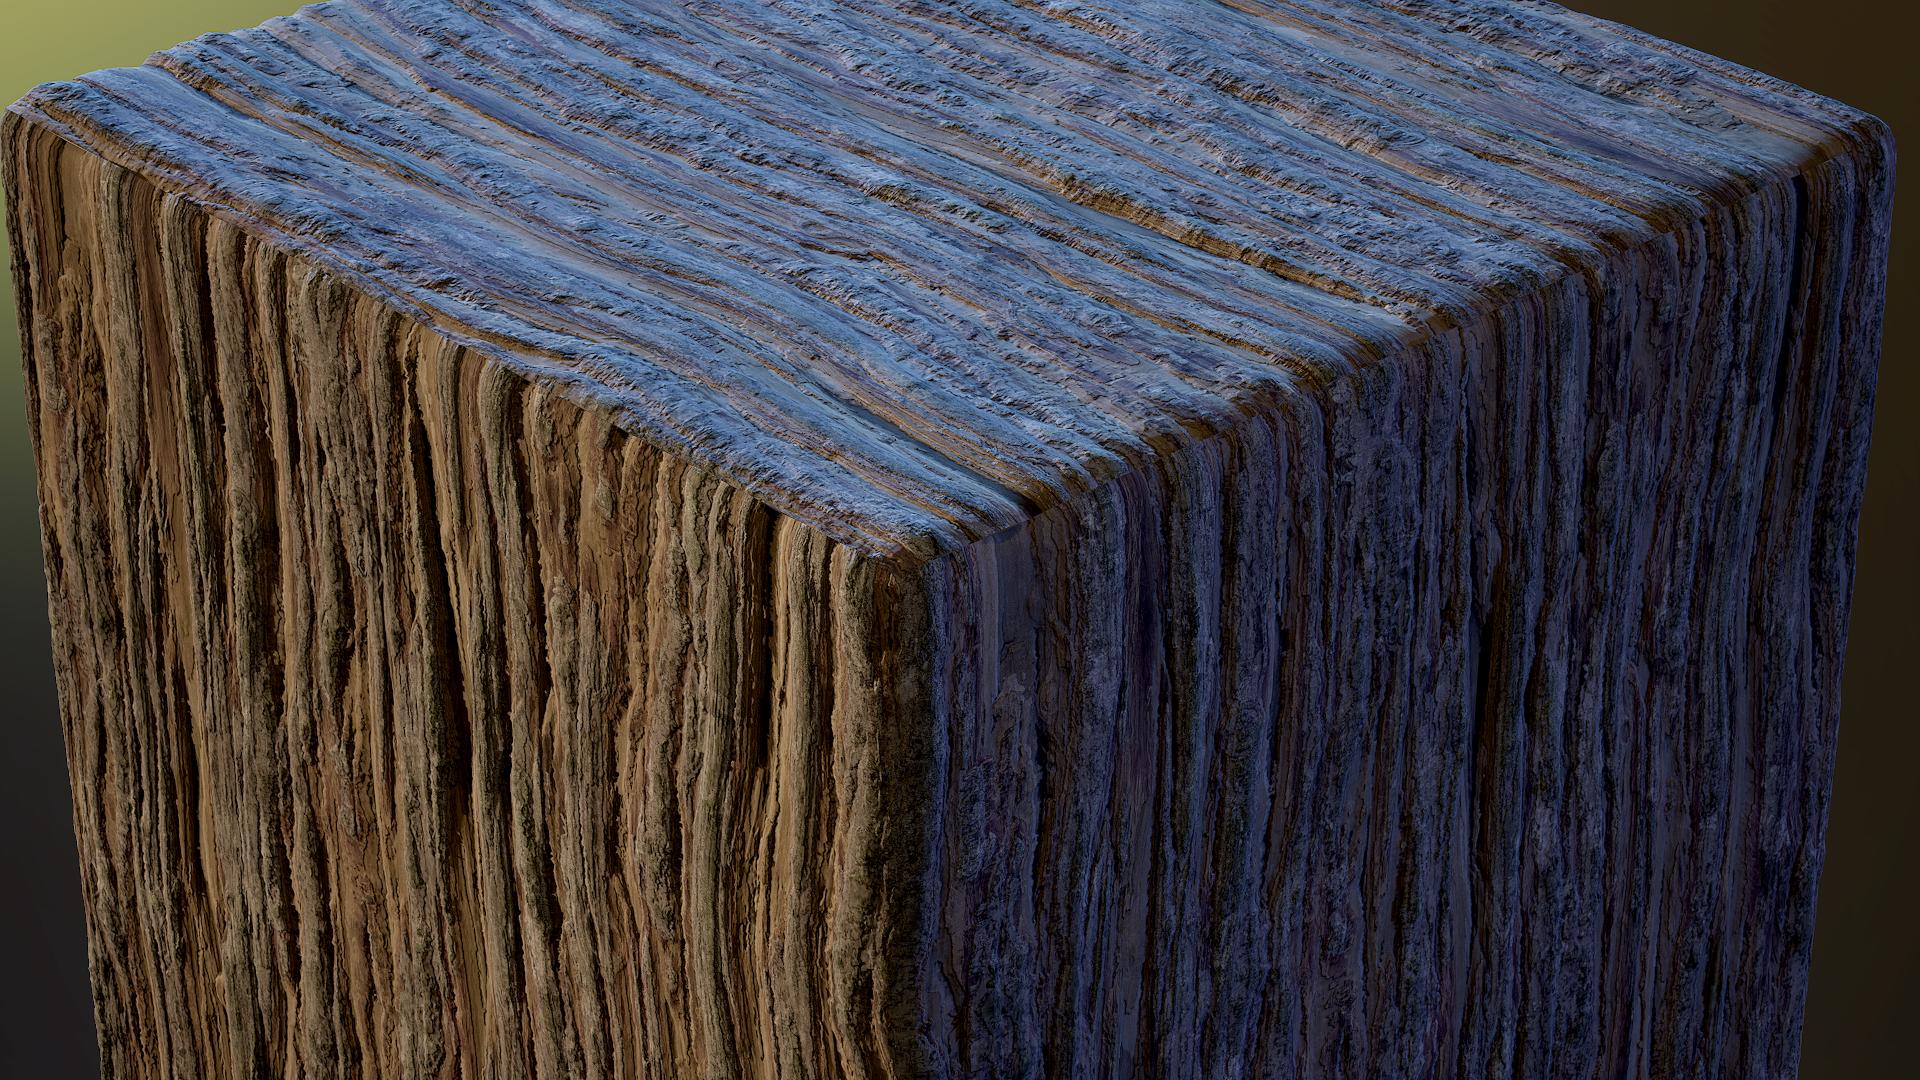 Cypress Bark - Substance Material Tutorial